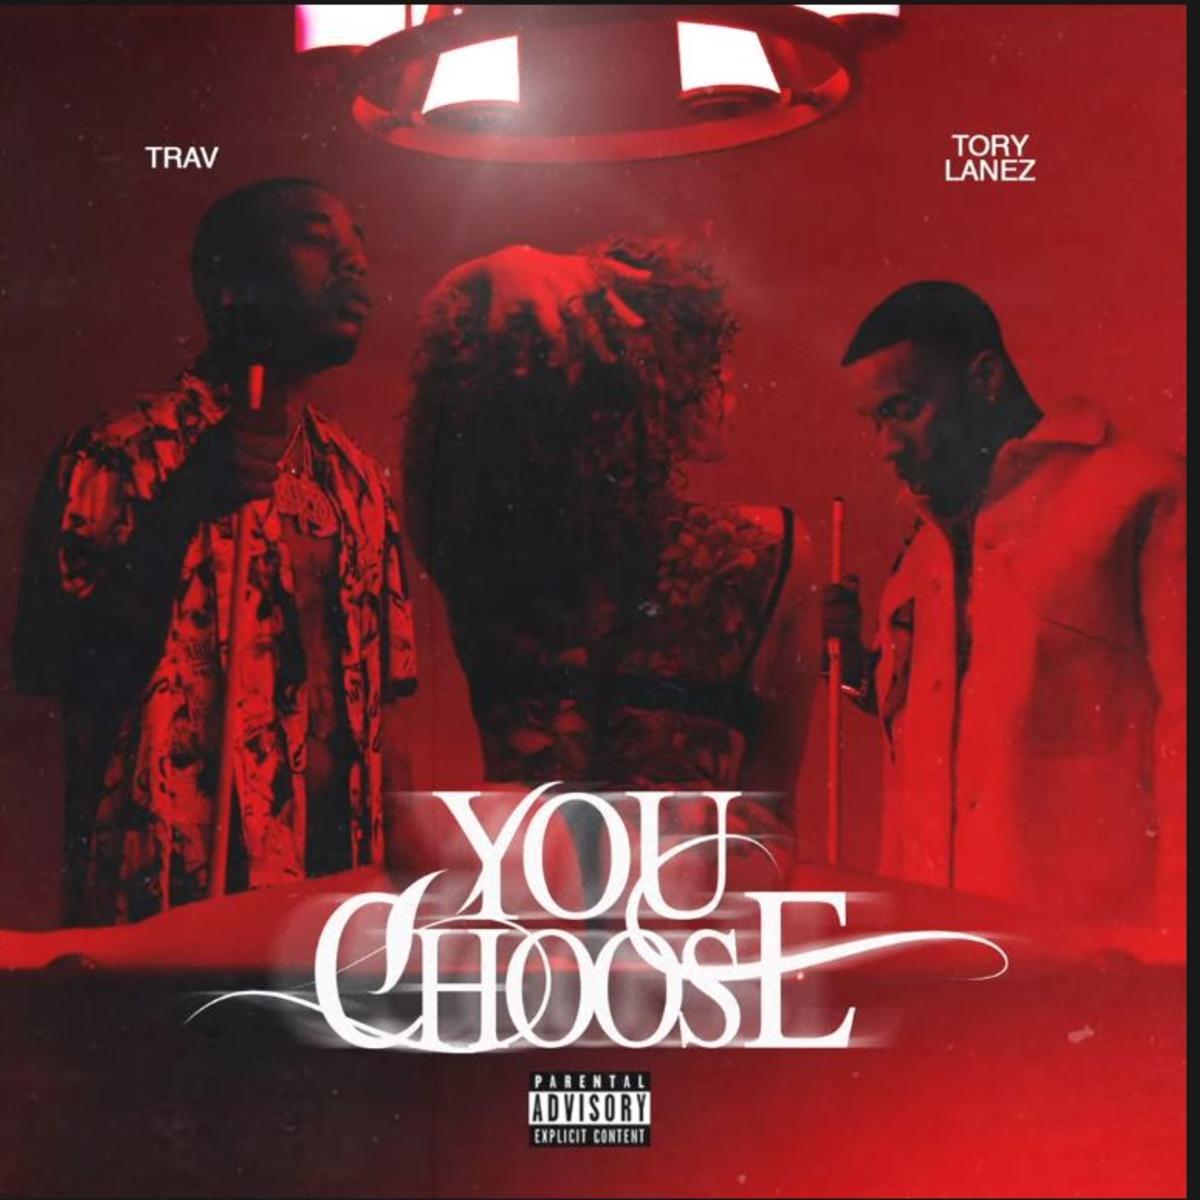 DOWNLOAD MP3 Trav Ft. Tory Lanez - You Choose